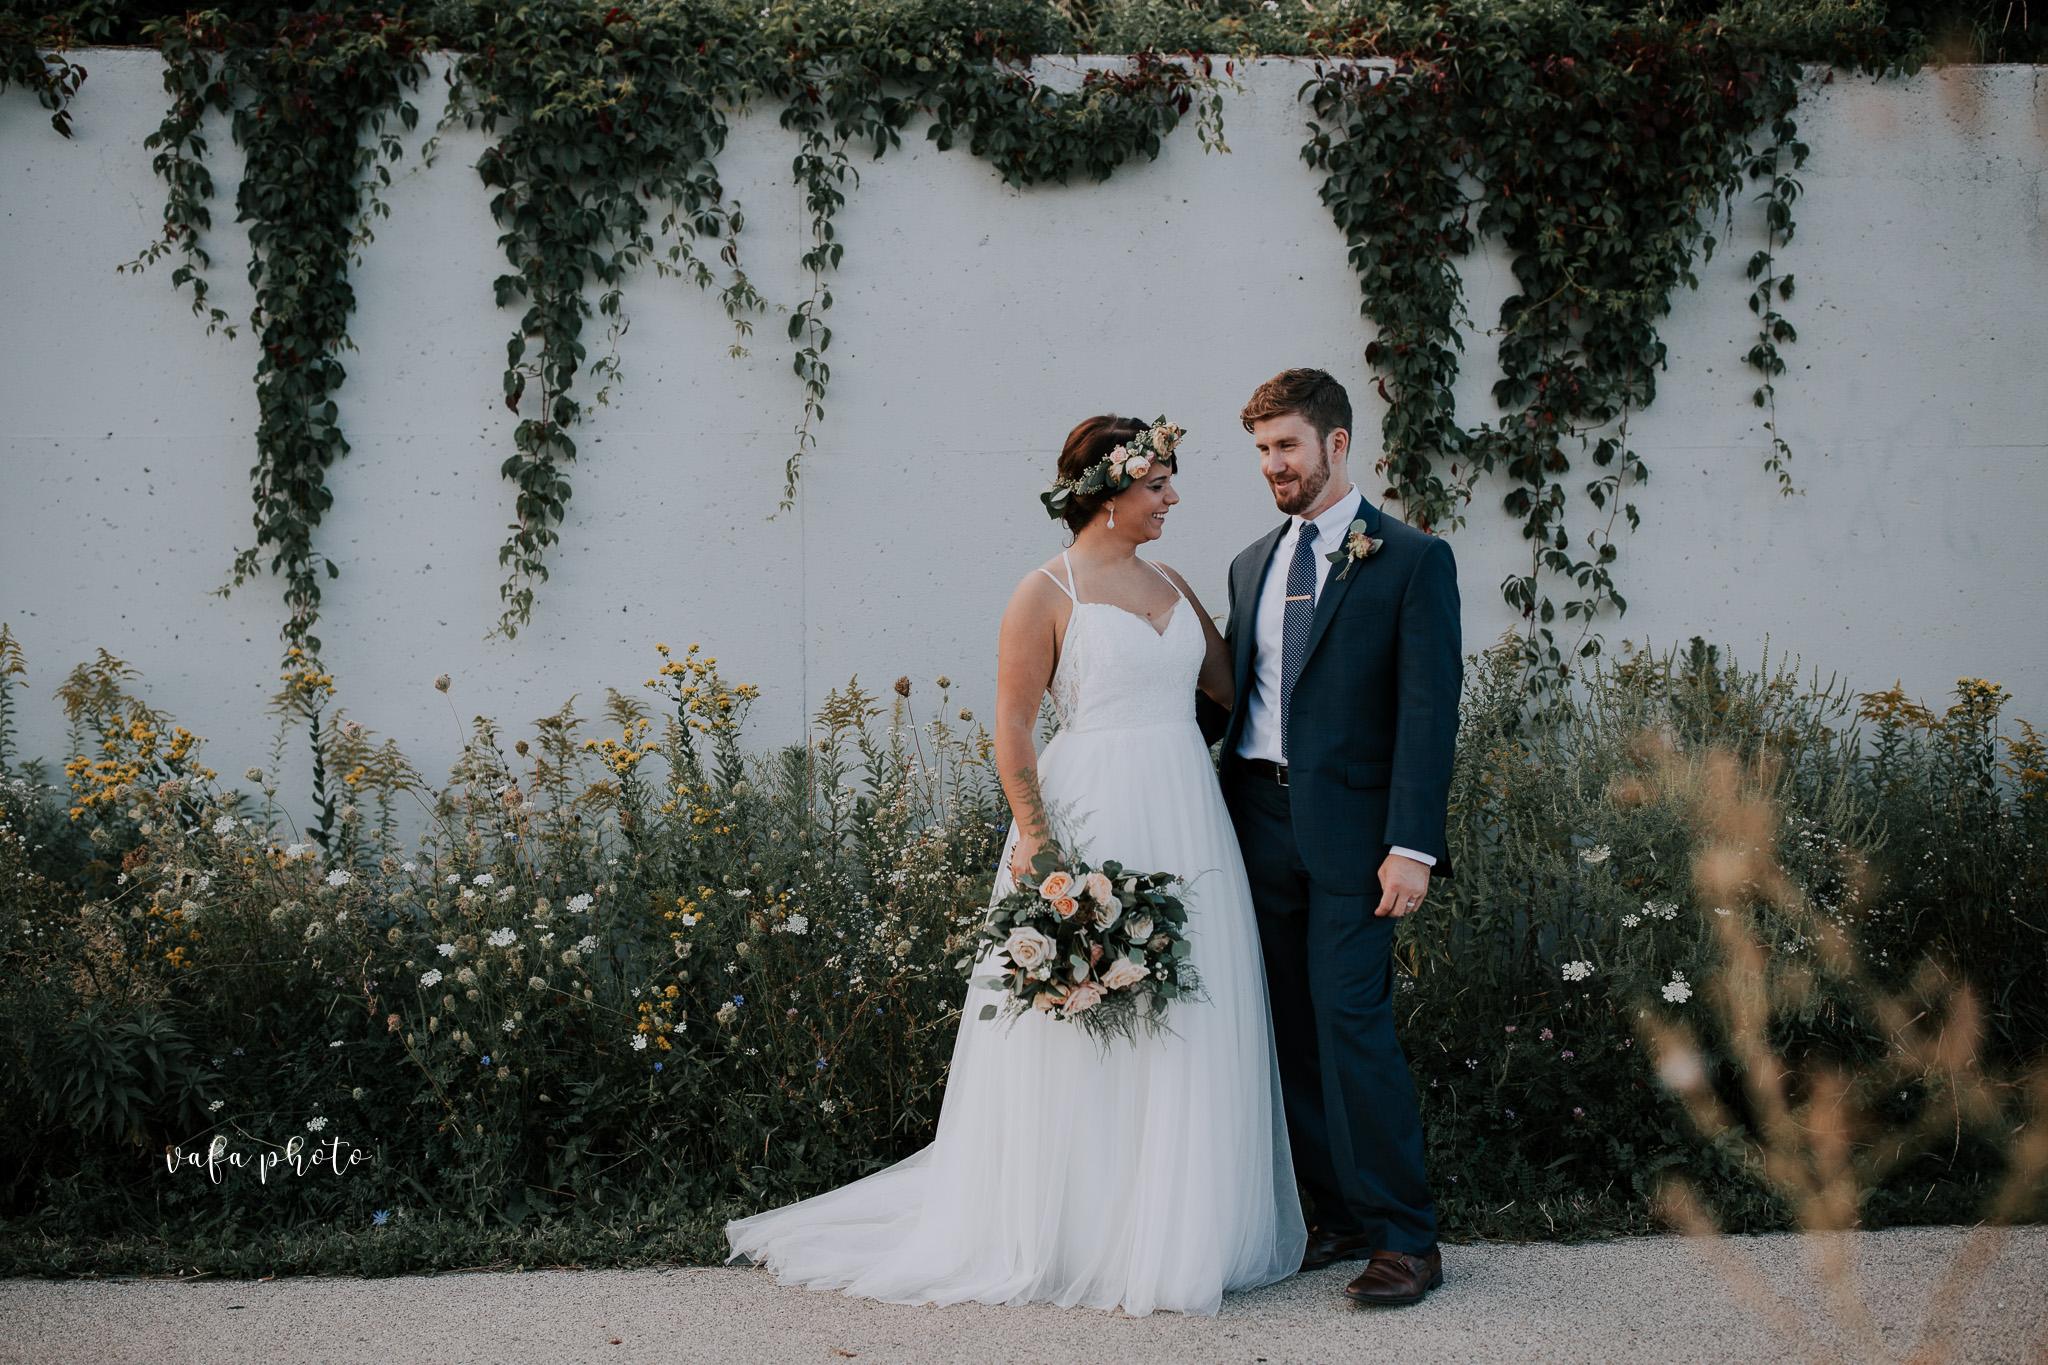 Milwaukee-Athletic-Club-Wedding-Amanda-Tony-Vafa-Photo-778.jpg